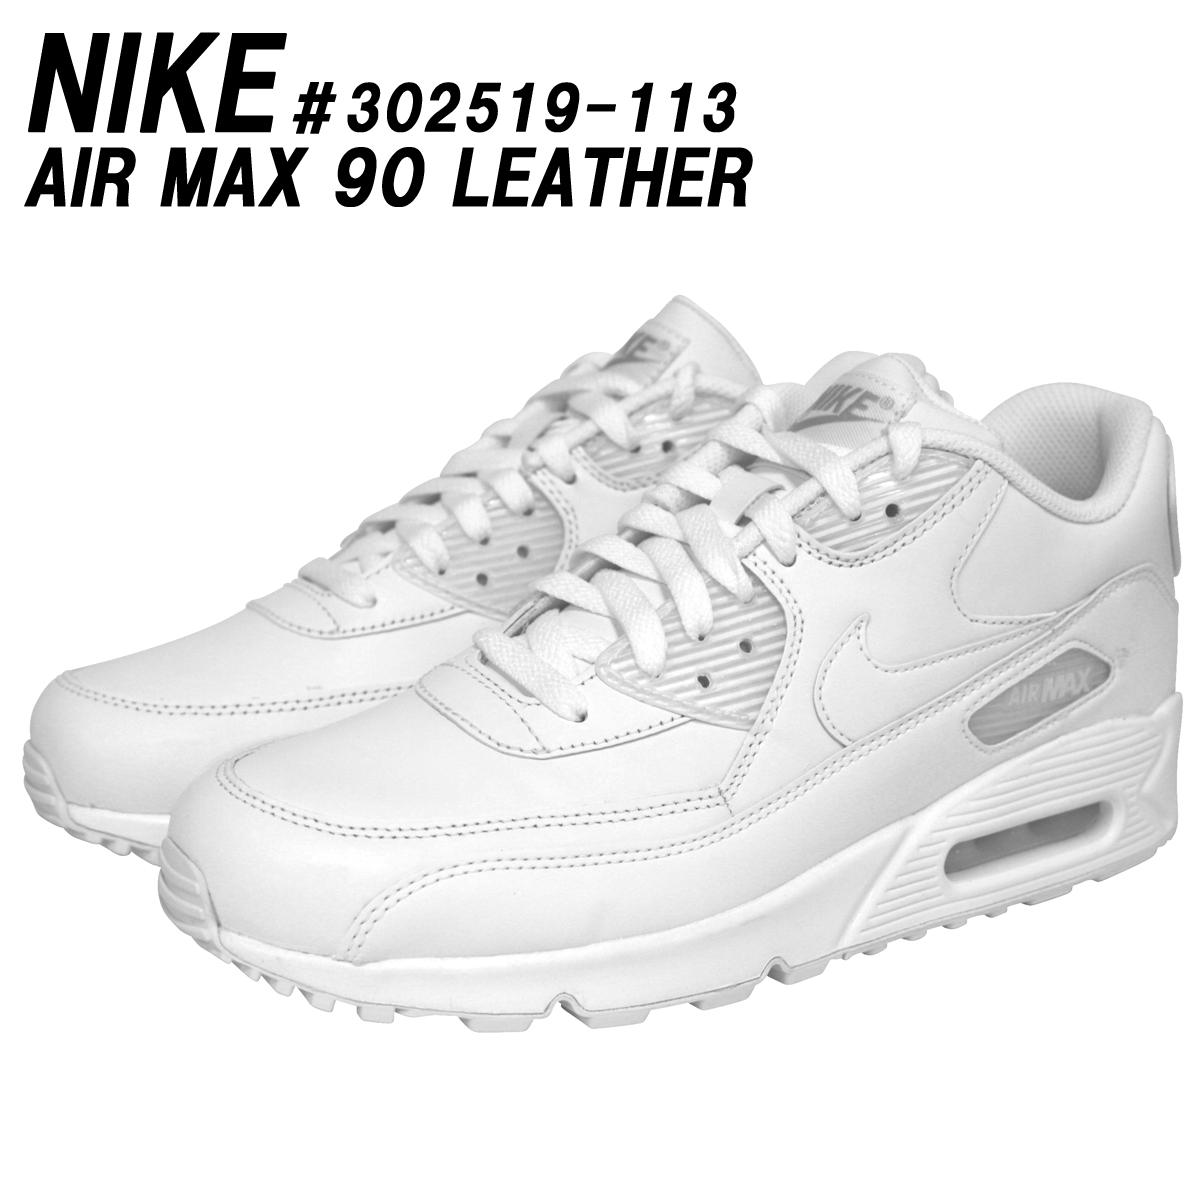 NIKE AIR MAX 90 LEATHERナイキ エア マックス 90 レザー WHITEカラー302519-113サイズ交換片道無料★【あす楽対応_関東】